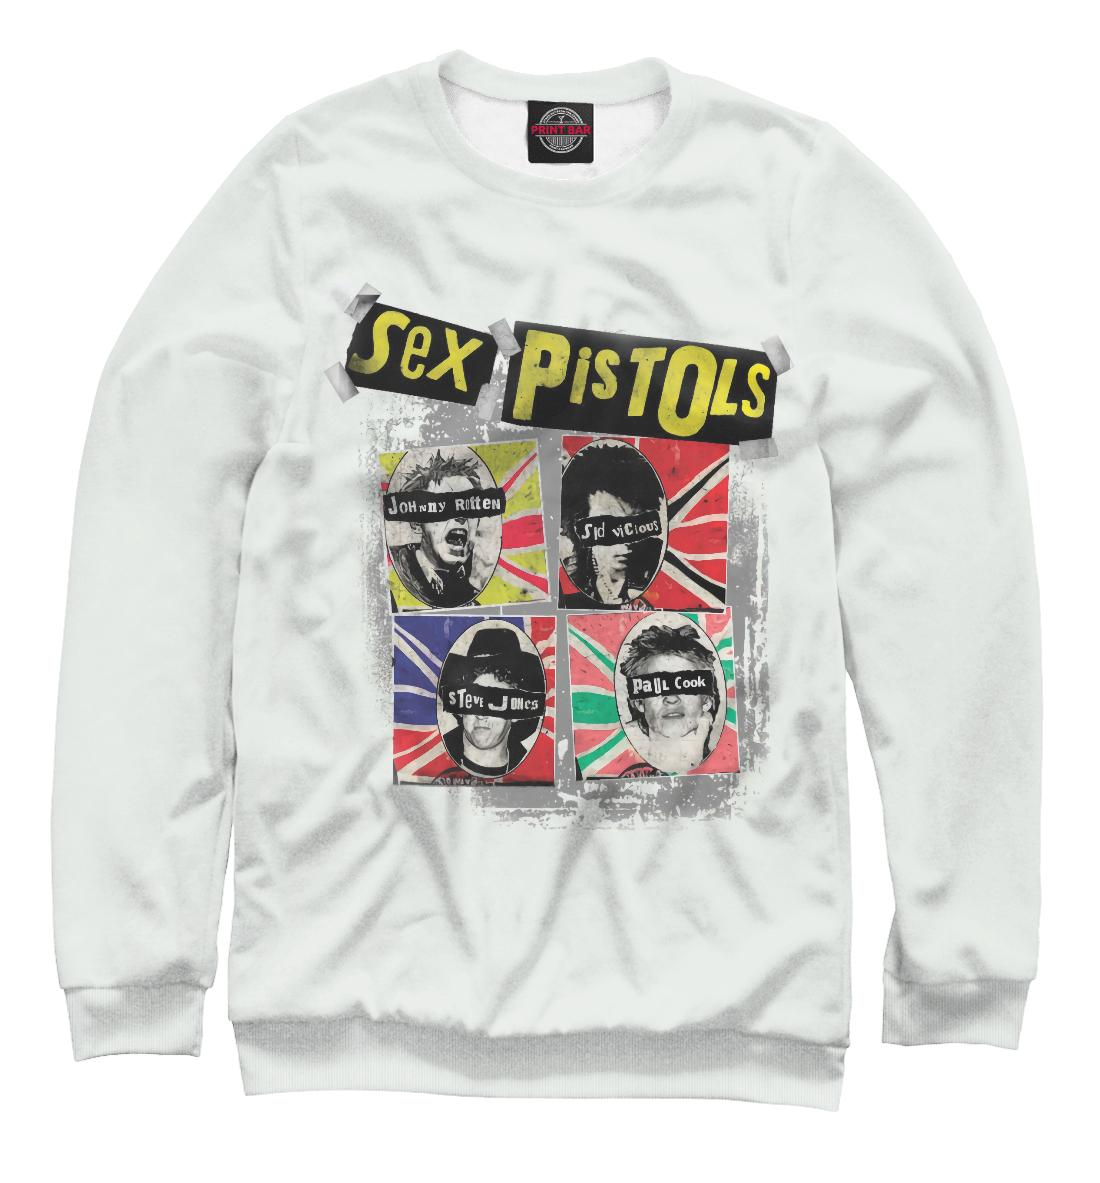 Купить Sex Pistols, Printbar, Свитшоты, MZK-849041-swi-1